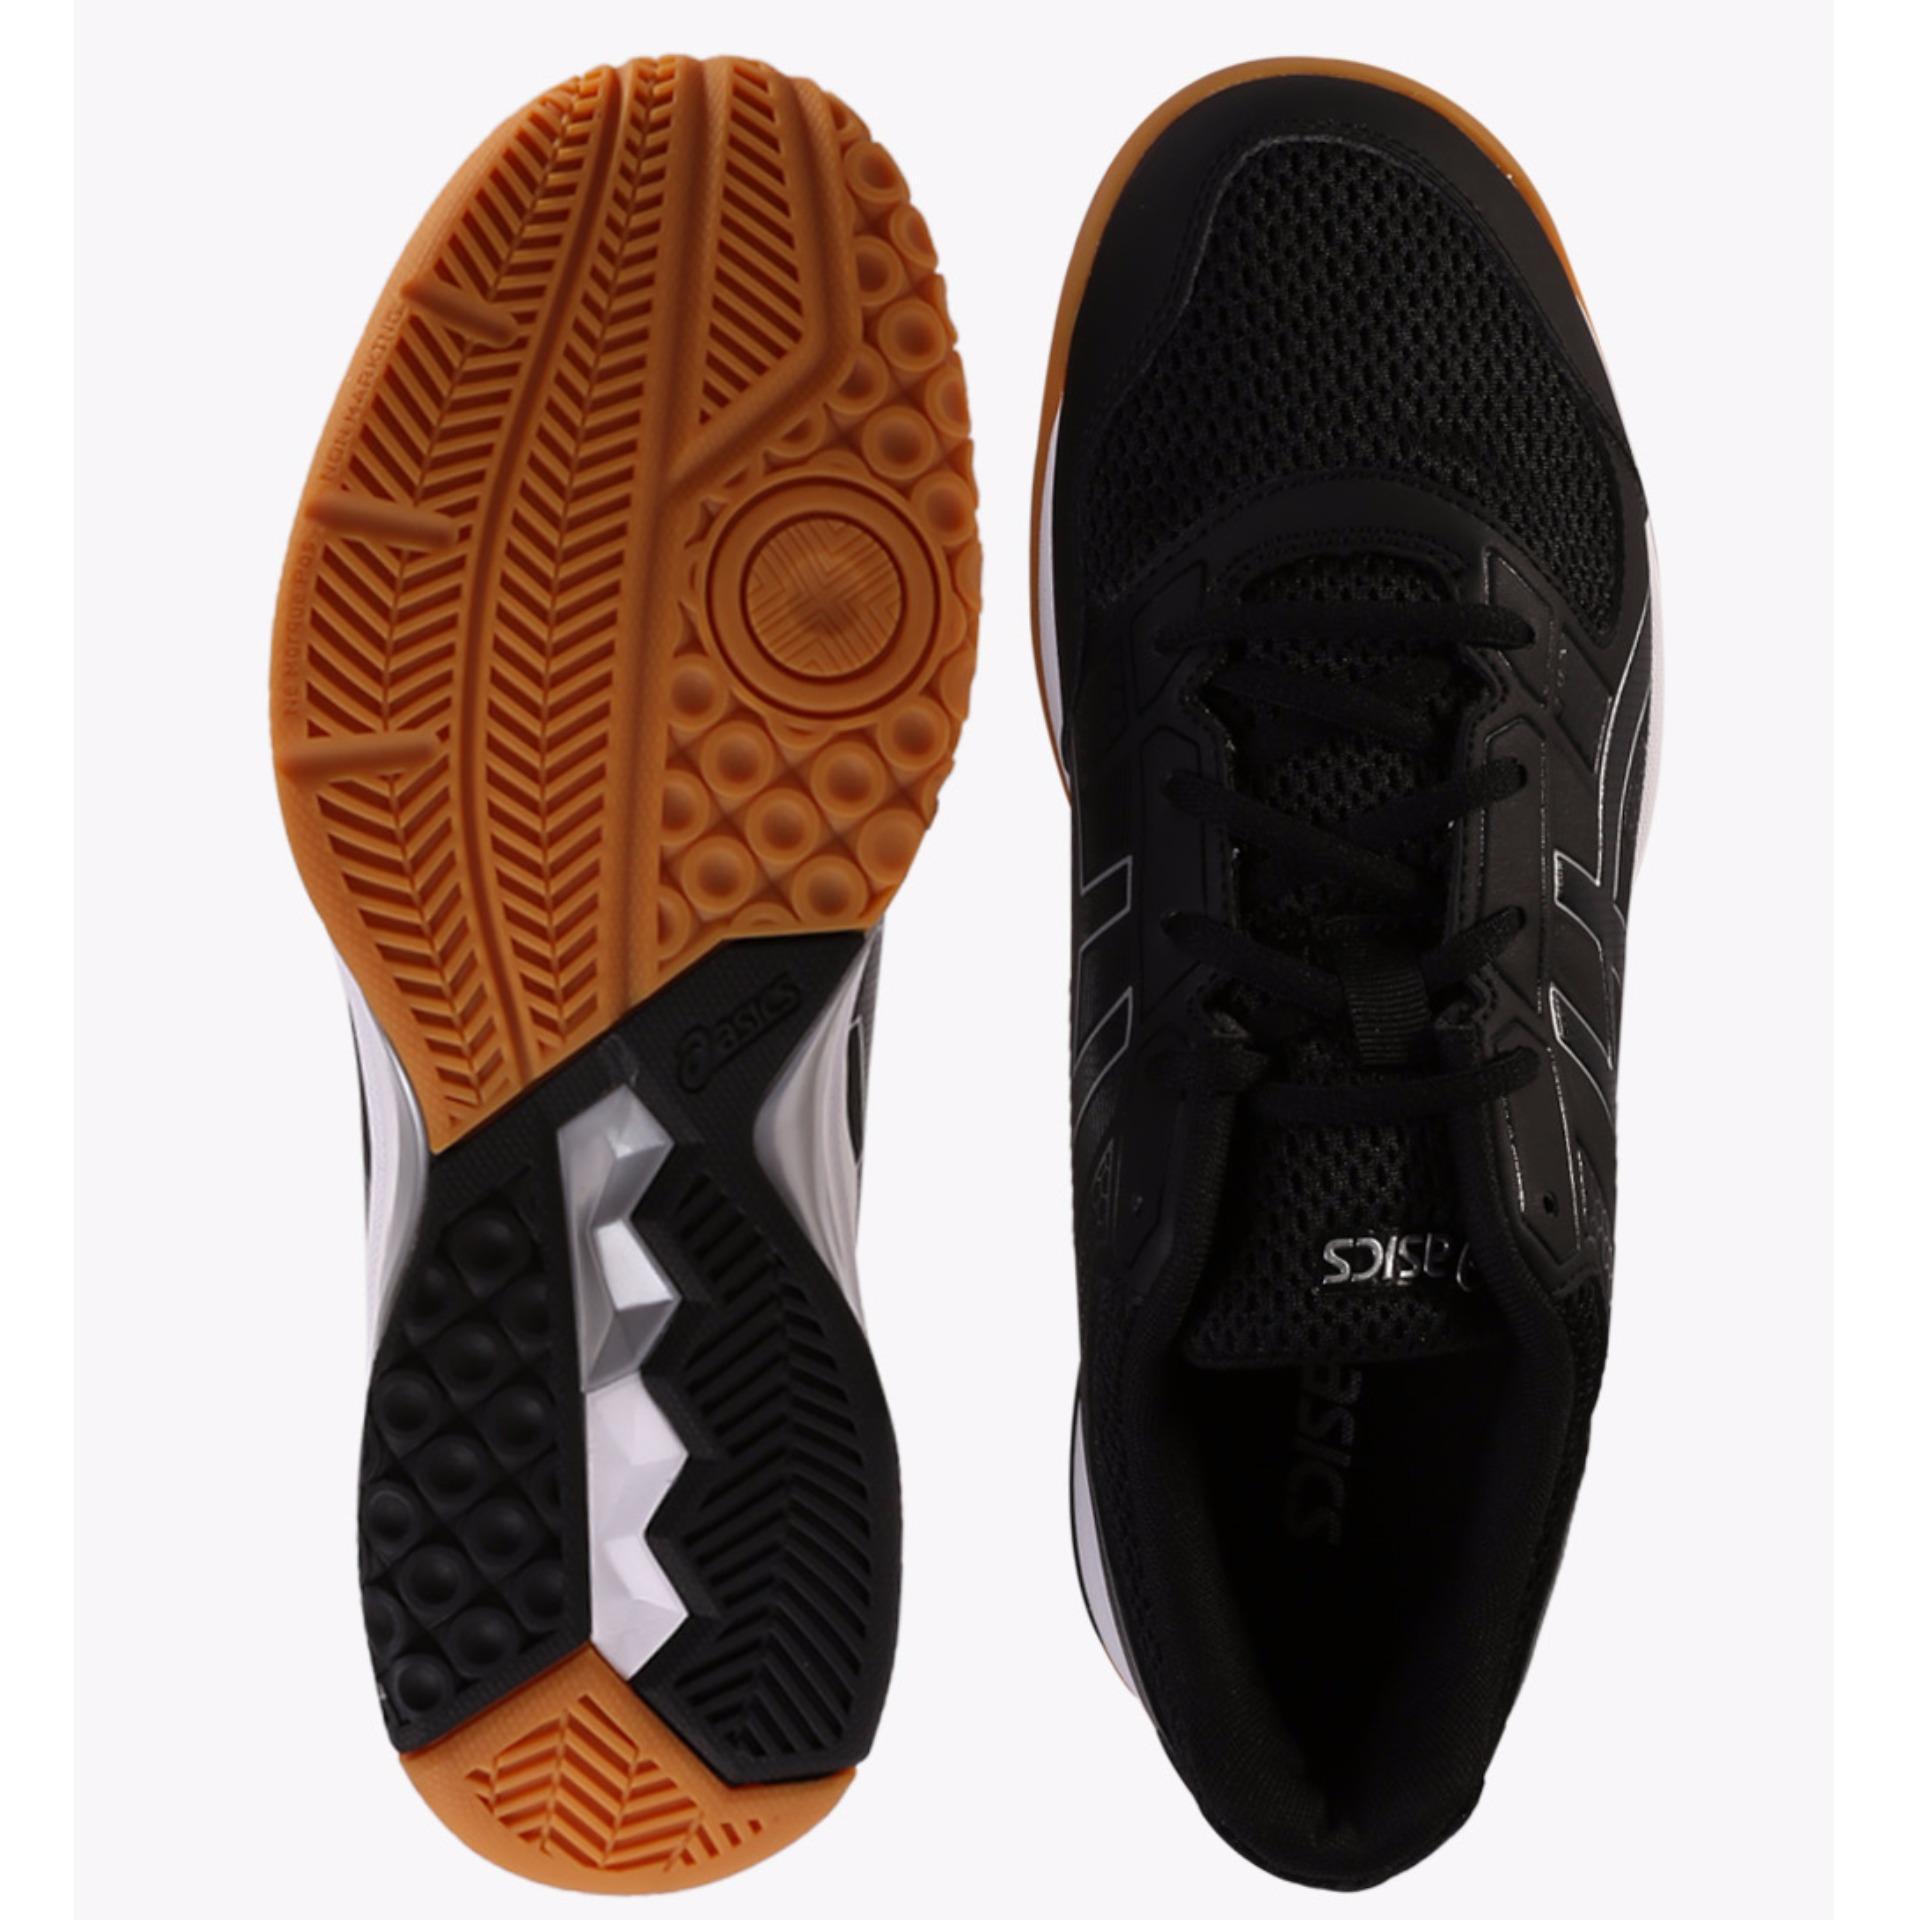 Price Checker Asics Gel-Rocket 8 Men s Court Shoes - Hitam Harga ... 489ae6fa43